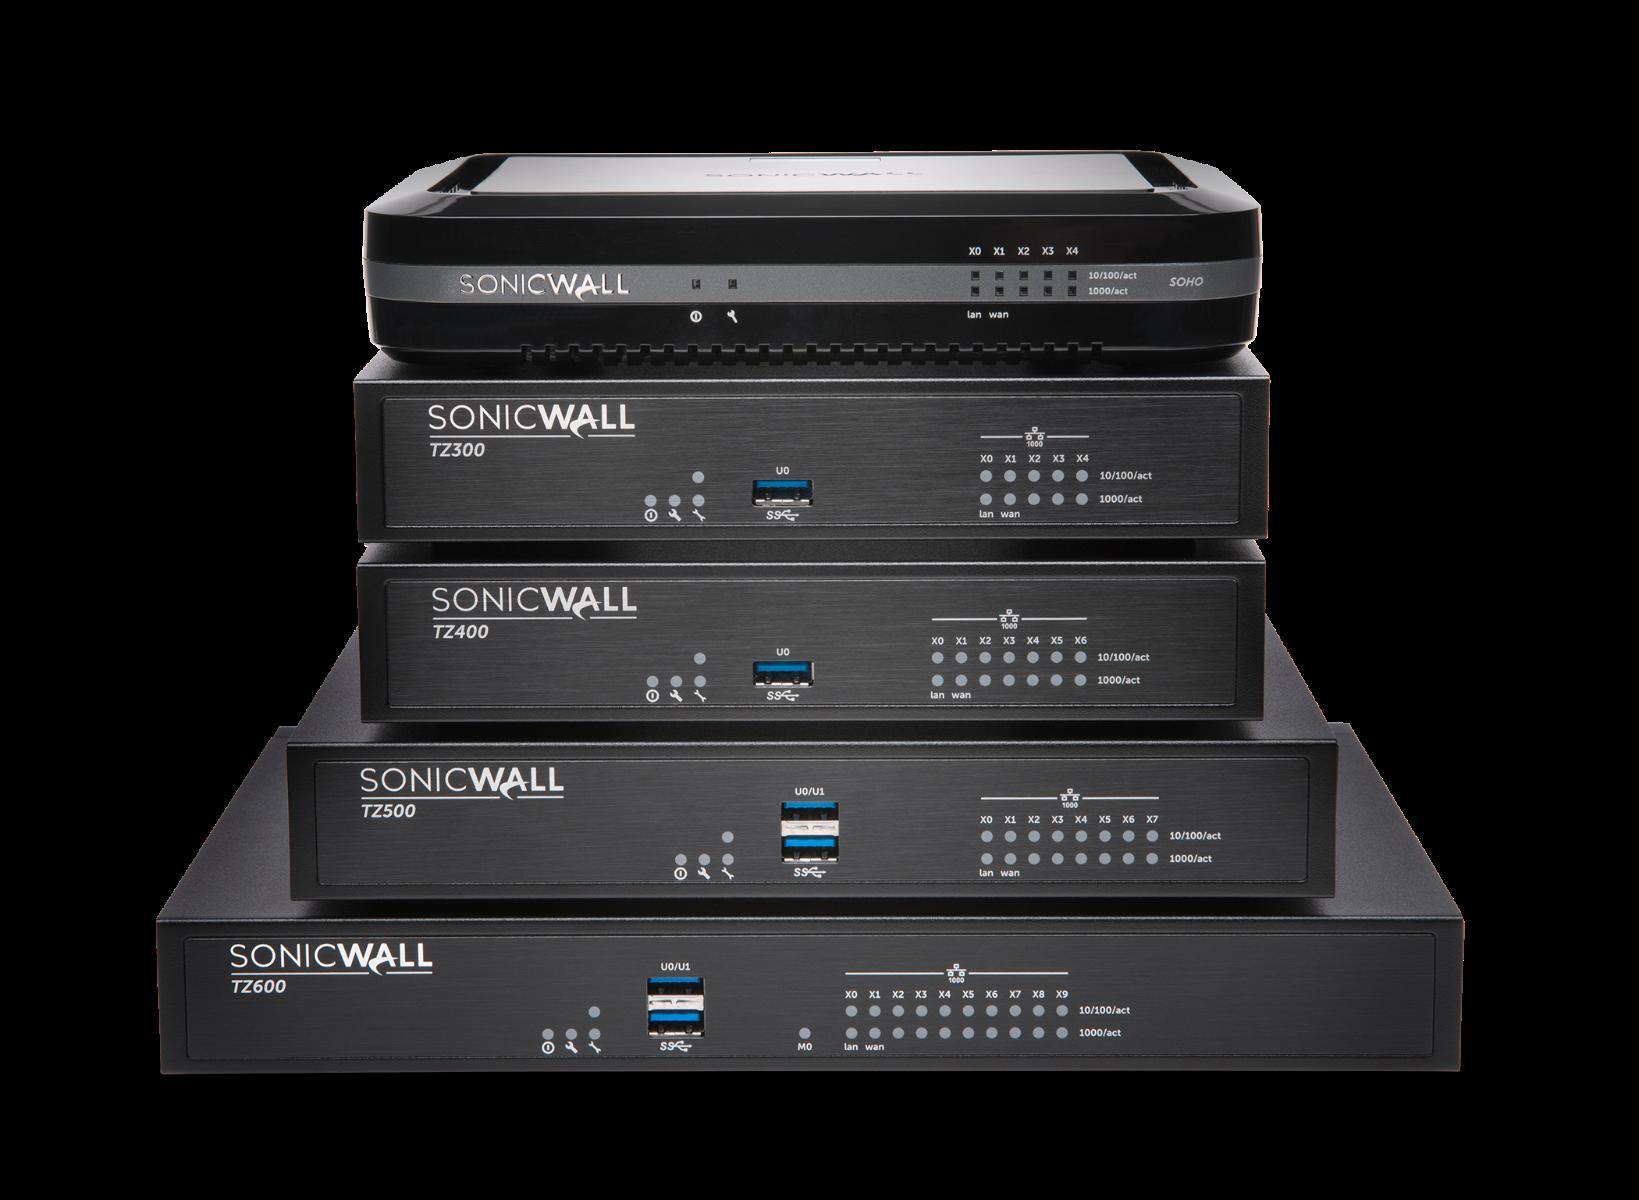 SonicWall Firewalls